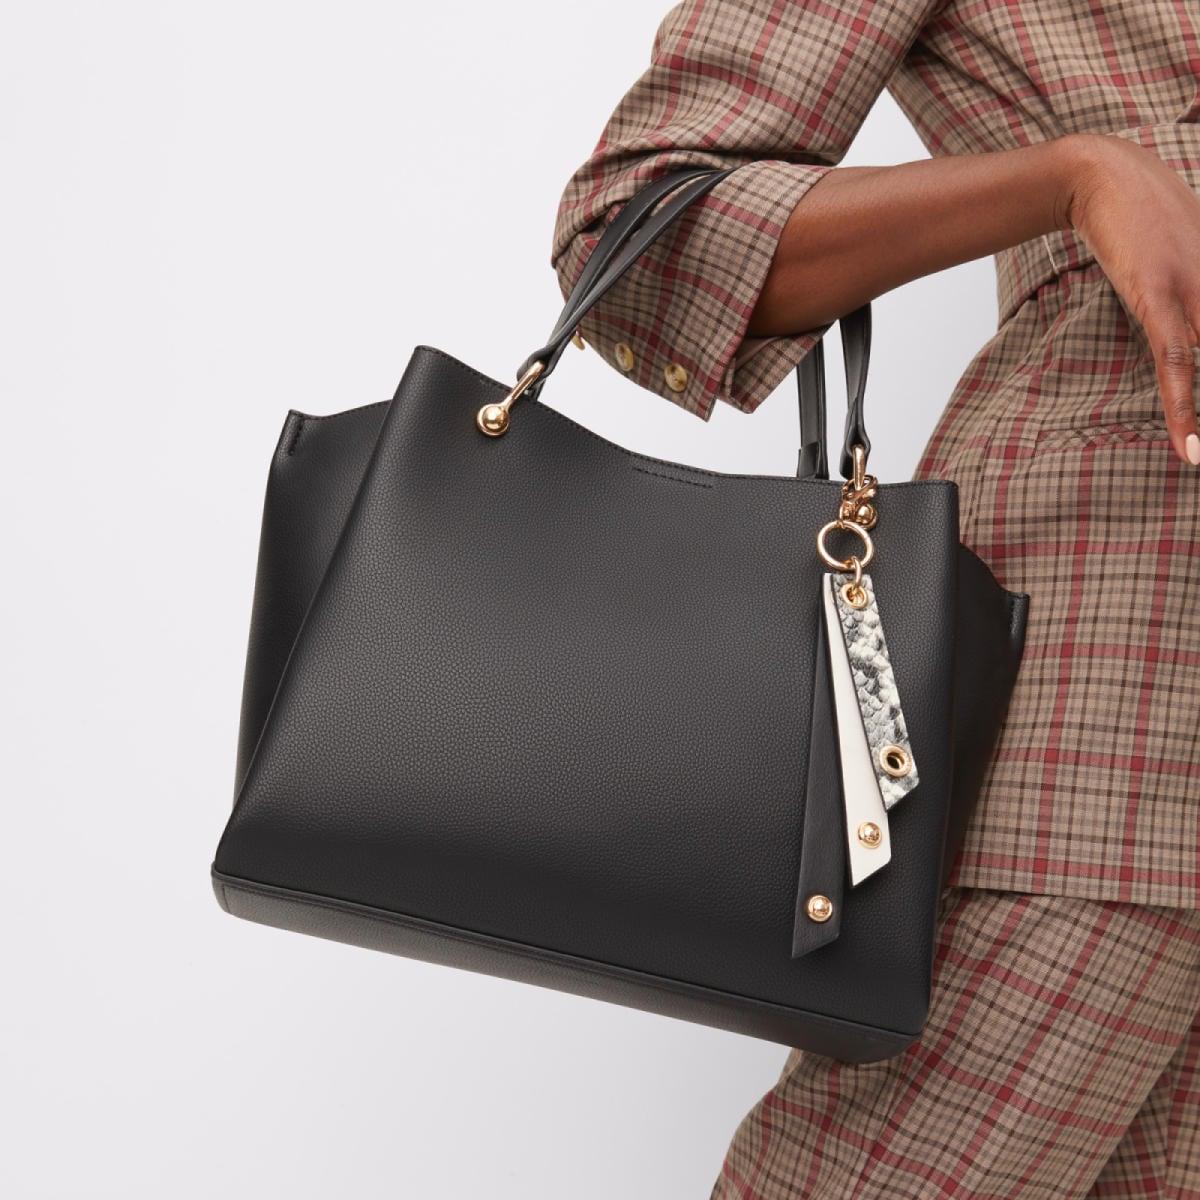 Nusz Black Women S Tote Bags Aldo Canada